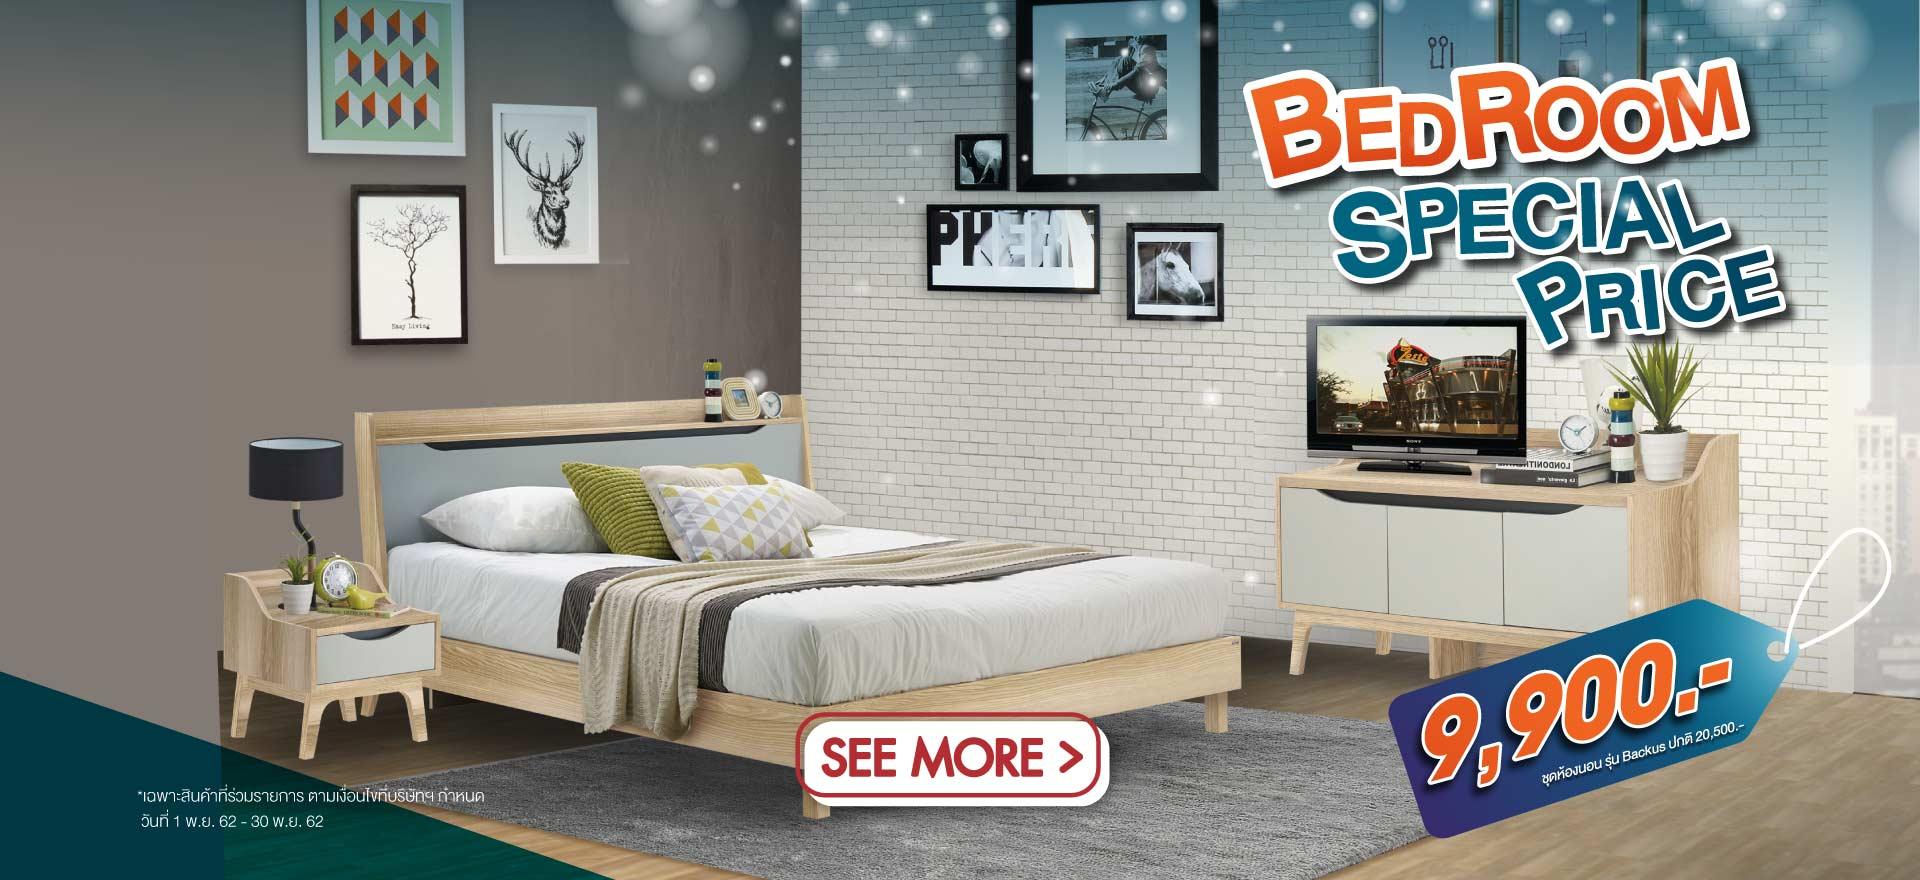 BEDROOM SPECIAL PRICE! เปลี่ยนชุดห้องนอนต้อนรับปีใหม่